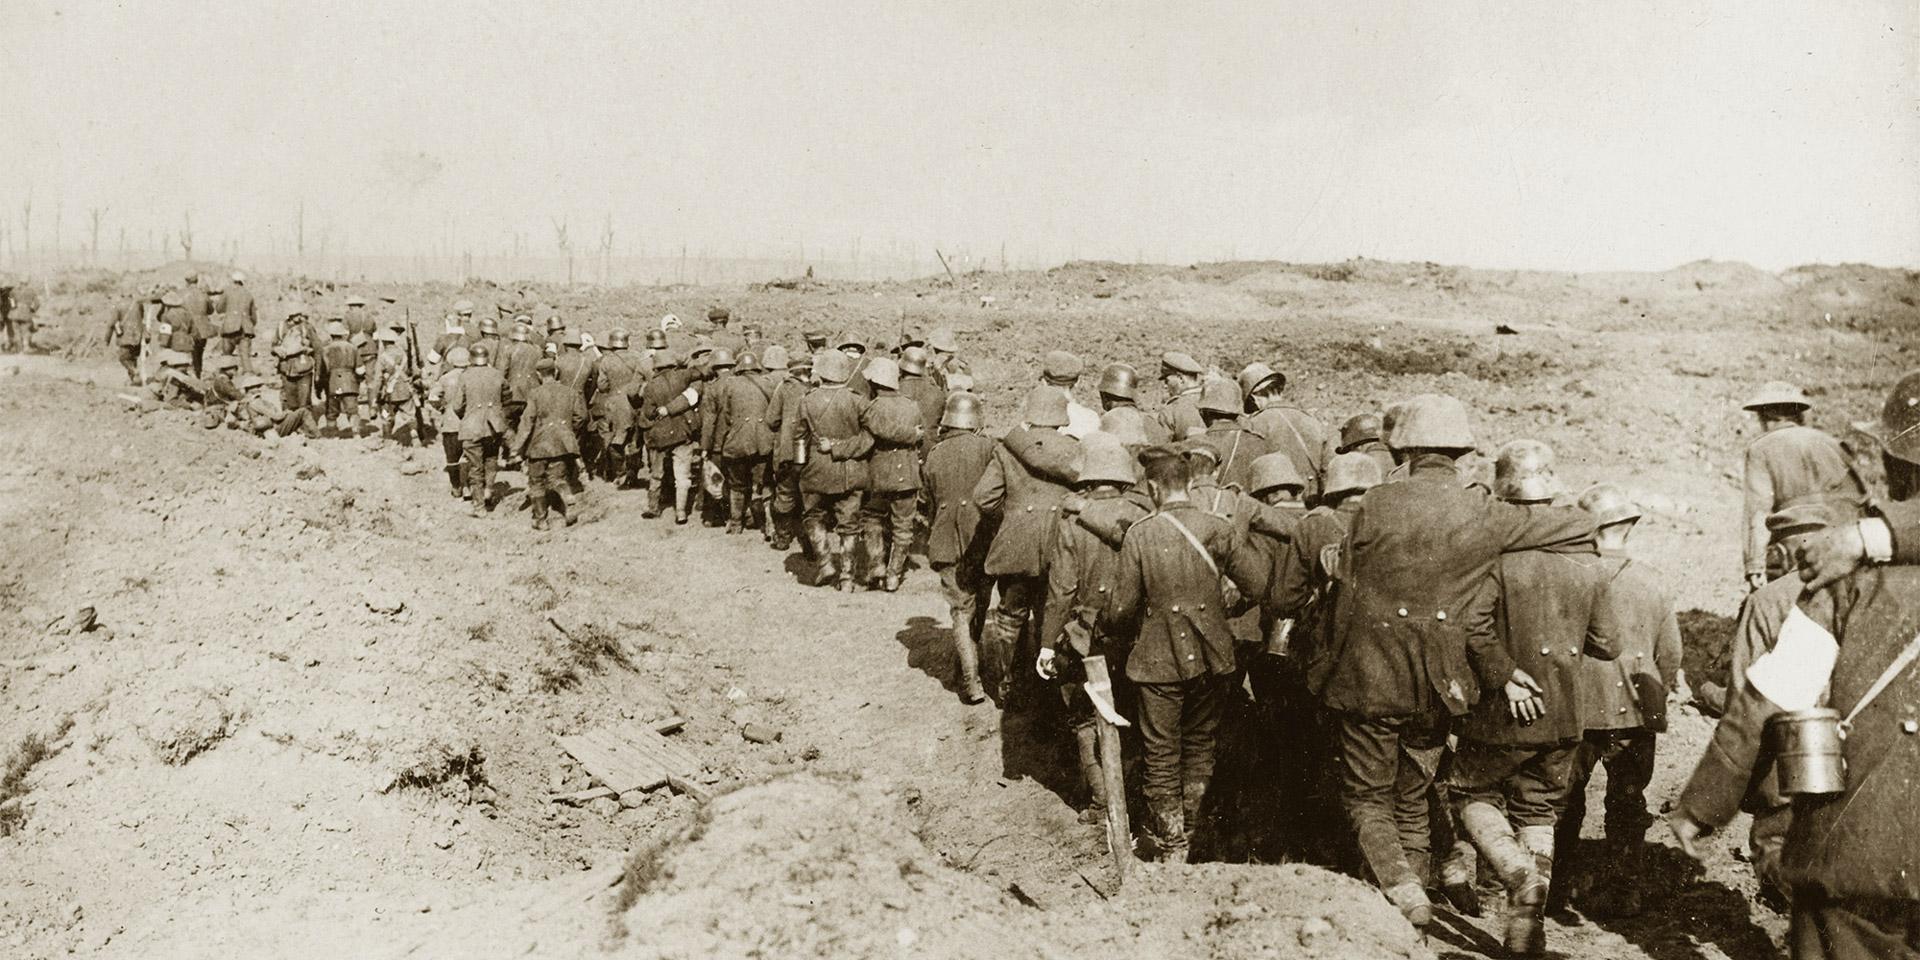 German prisoners of war captured during the battle of the Menin Road, 1917